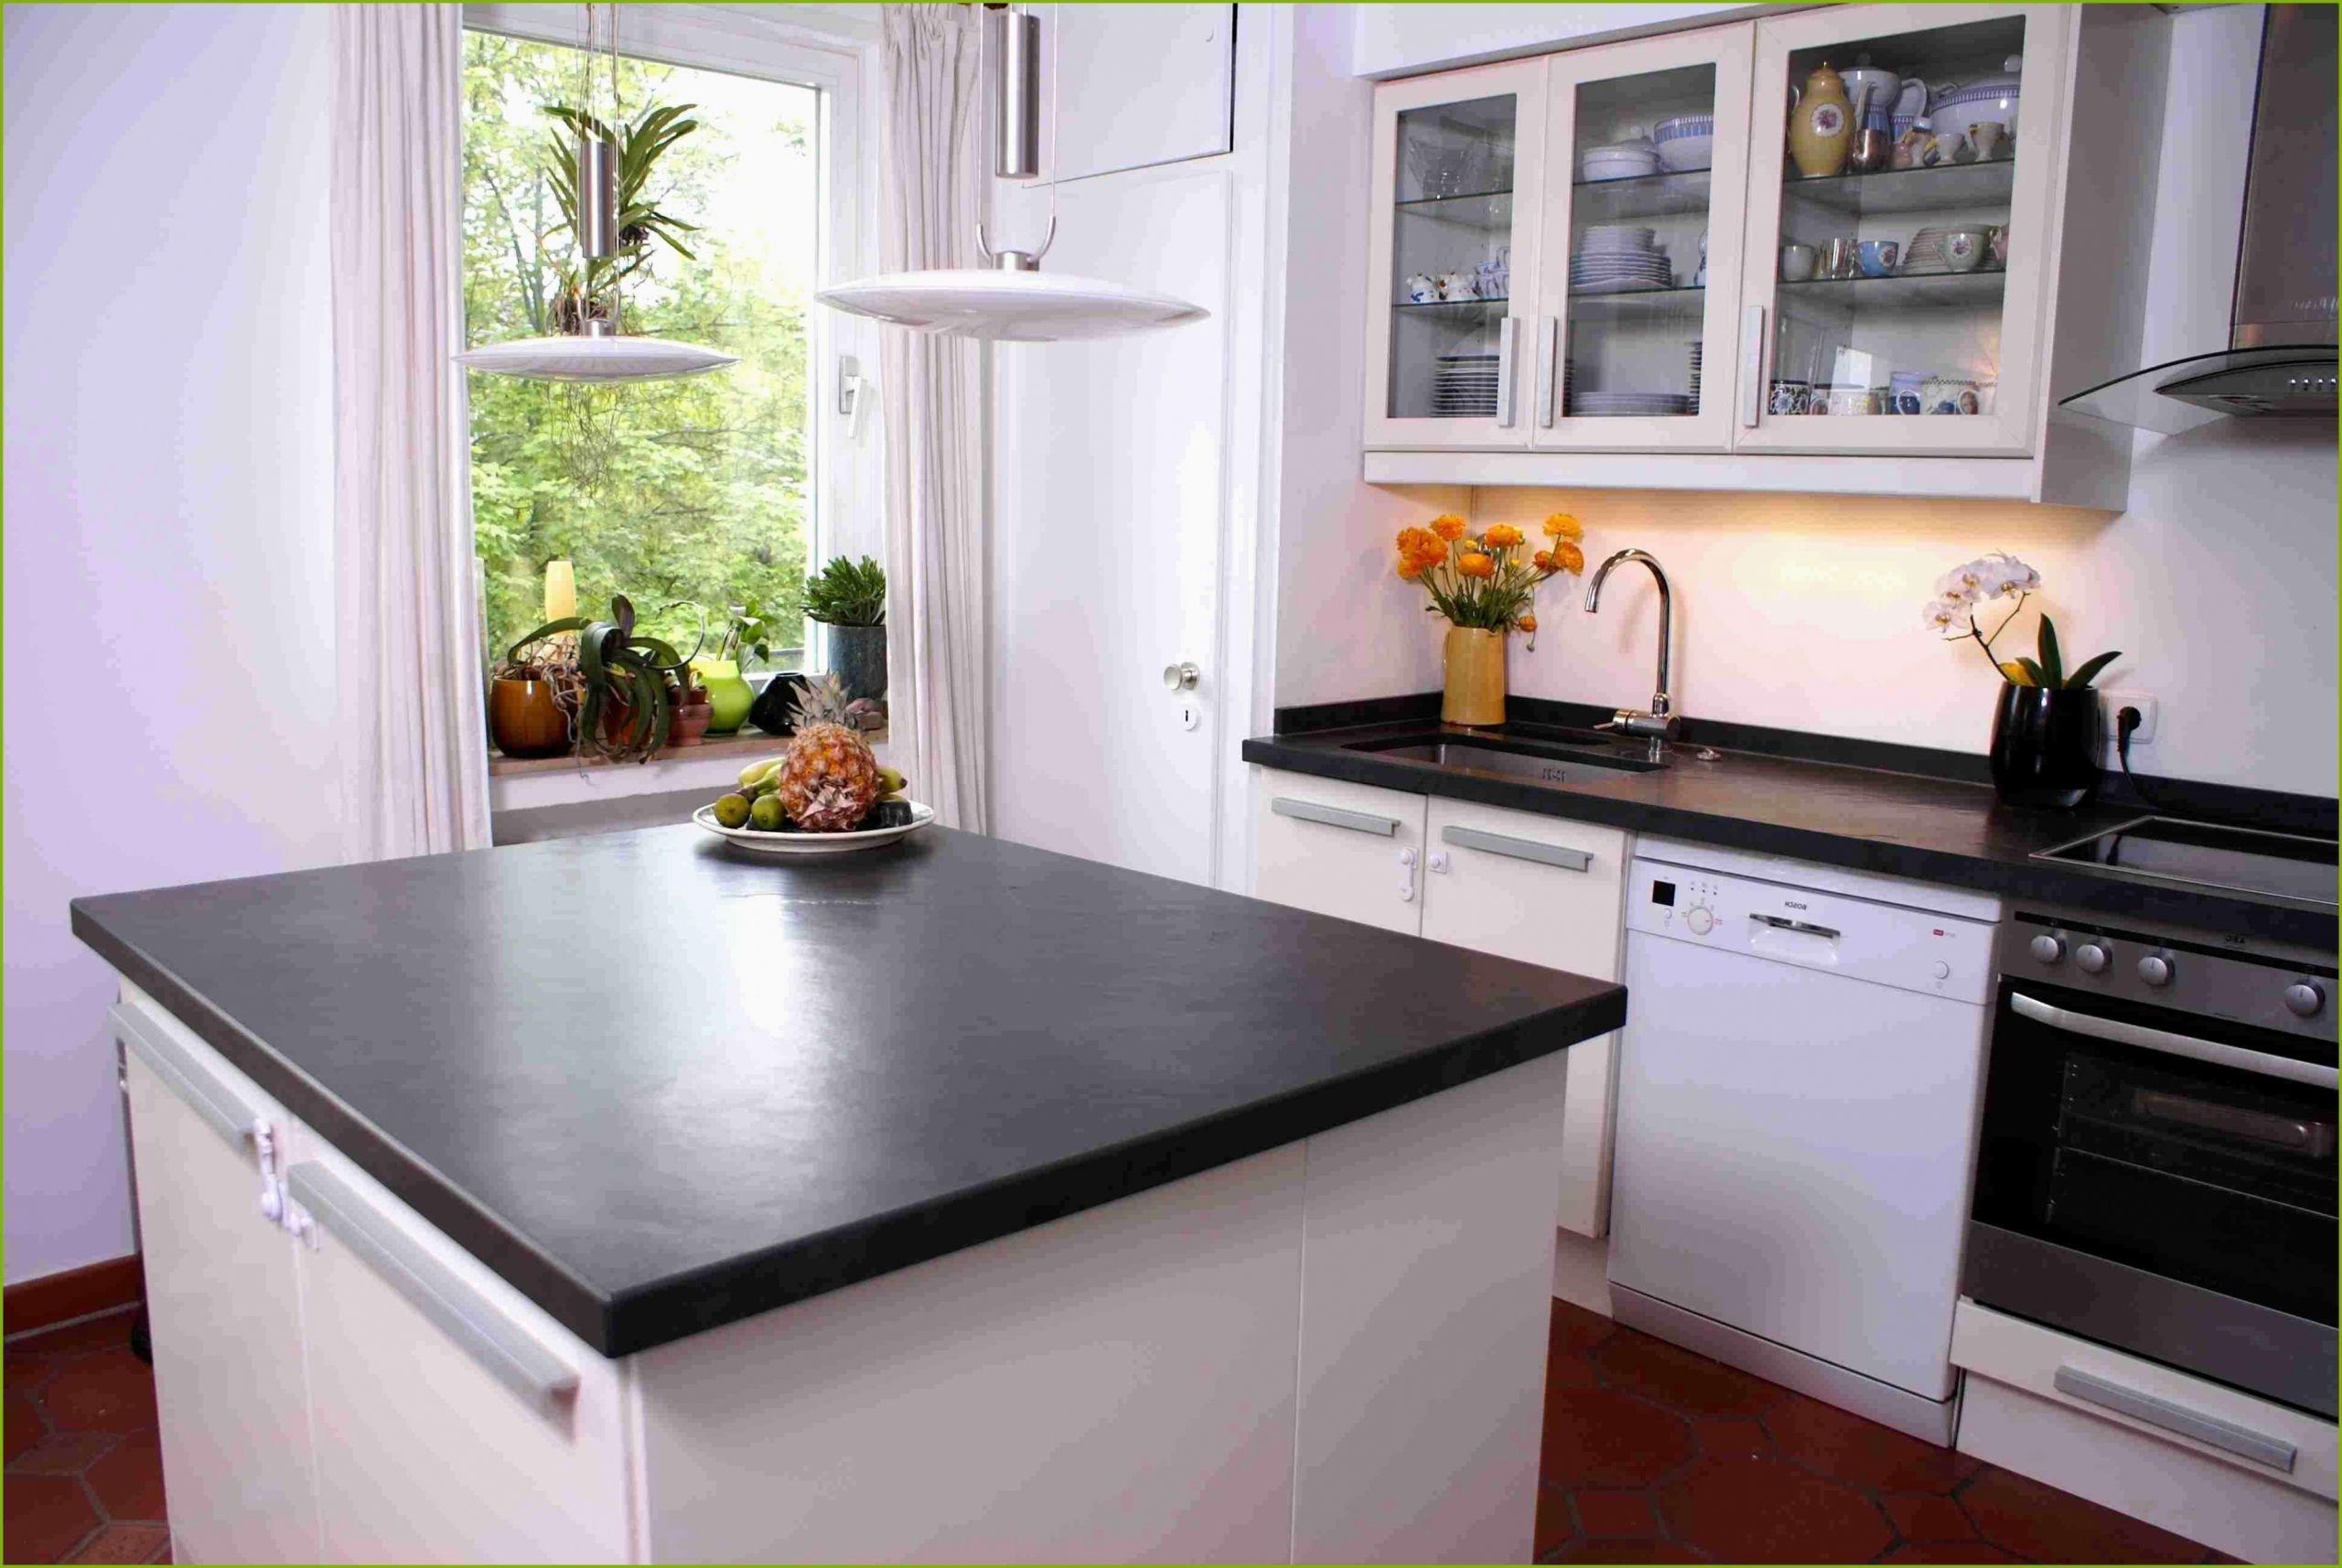 45 luxus deko ideen kuche galerie kuchen fur dachgeschosswohnungen kuchen fur dachgeschosswohnungen 8